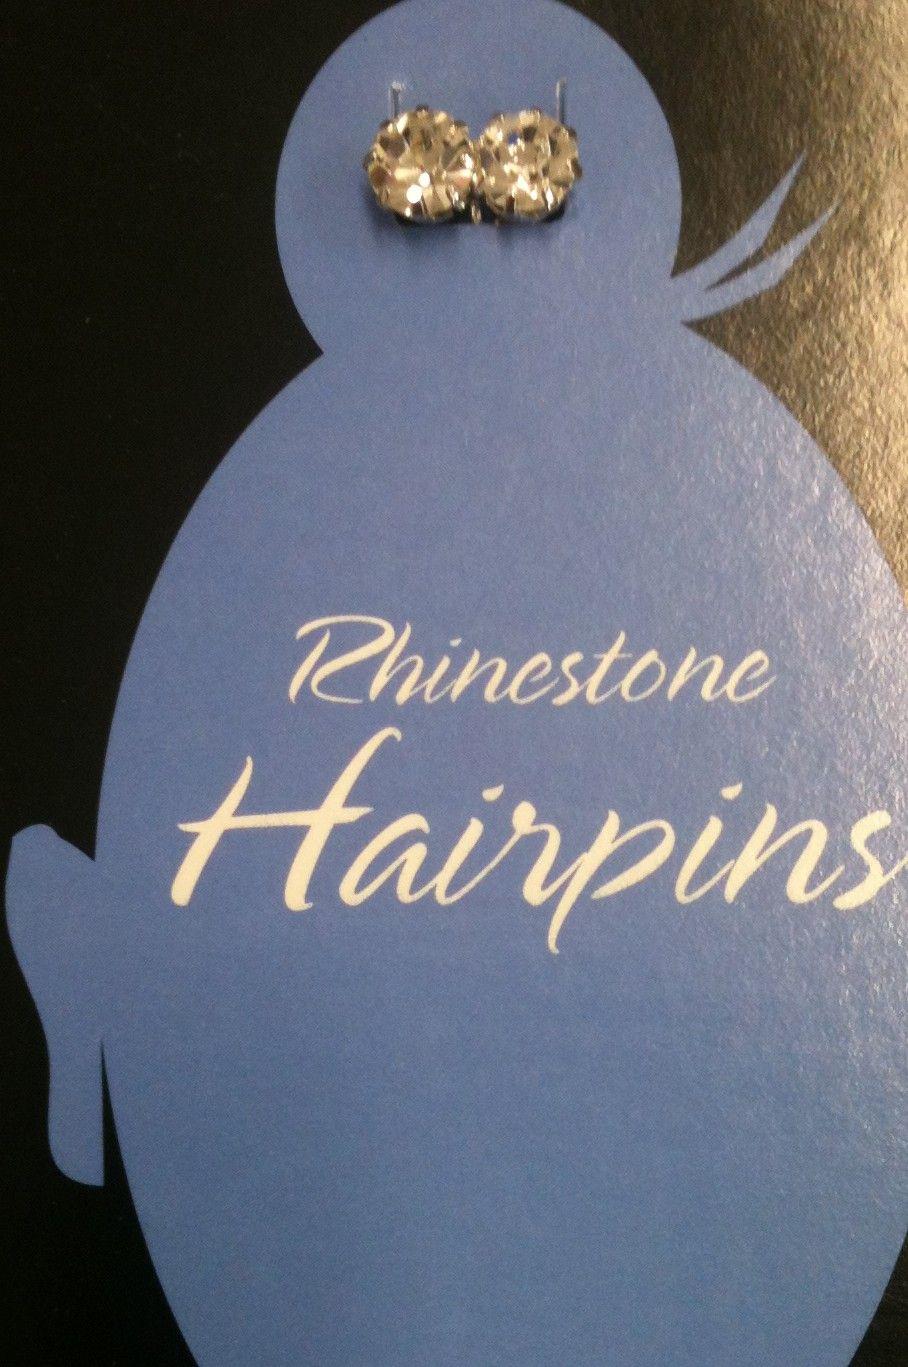 Rhinestone Hair Pin Stud (set of 2)...order online at